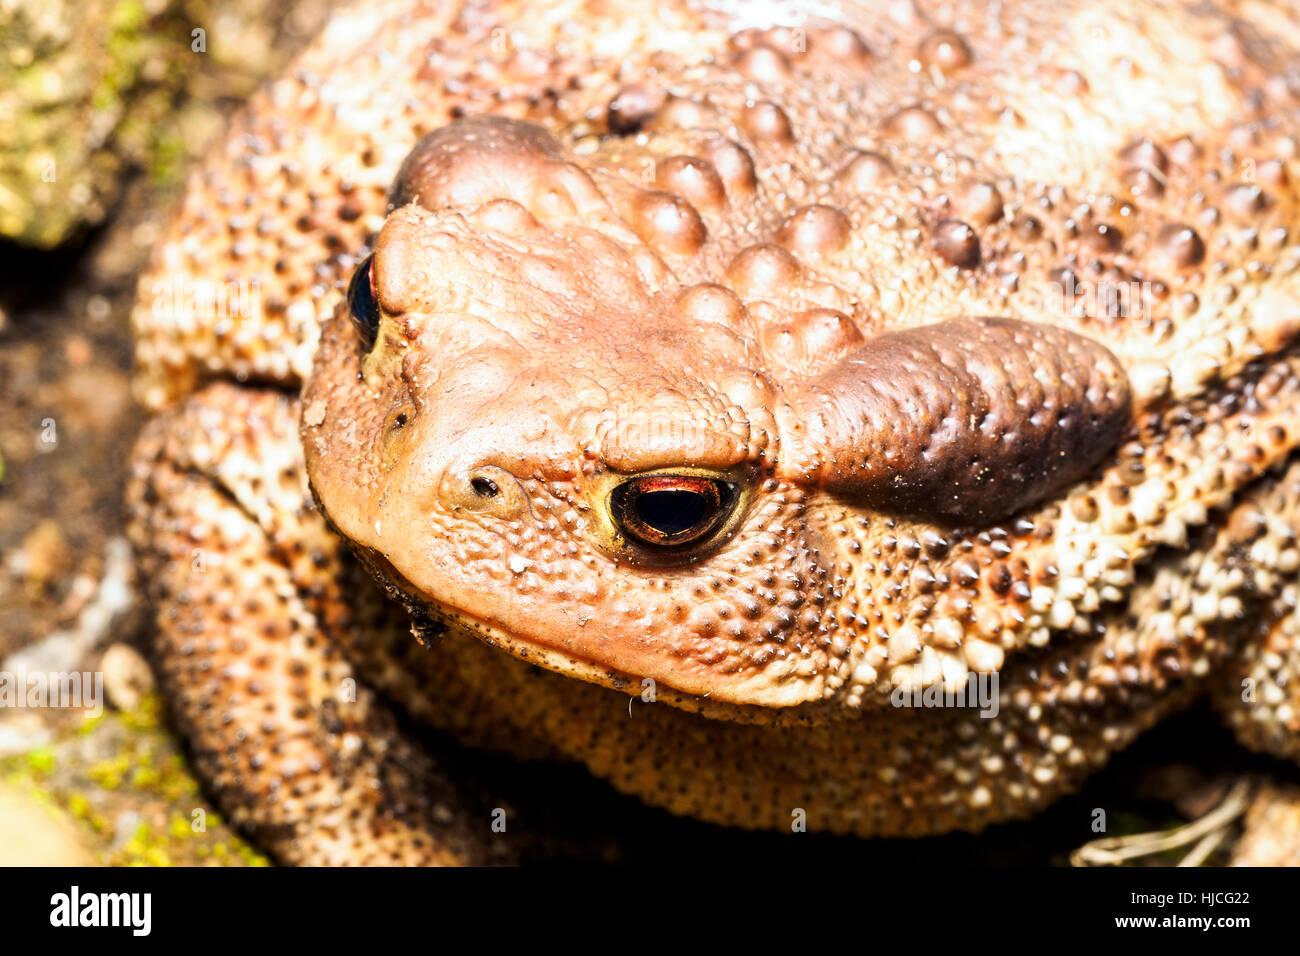 European common toad (Bufo bufo spinosus) - Umbria, Italy - Stock Image